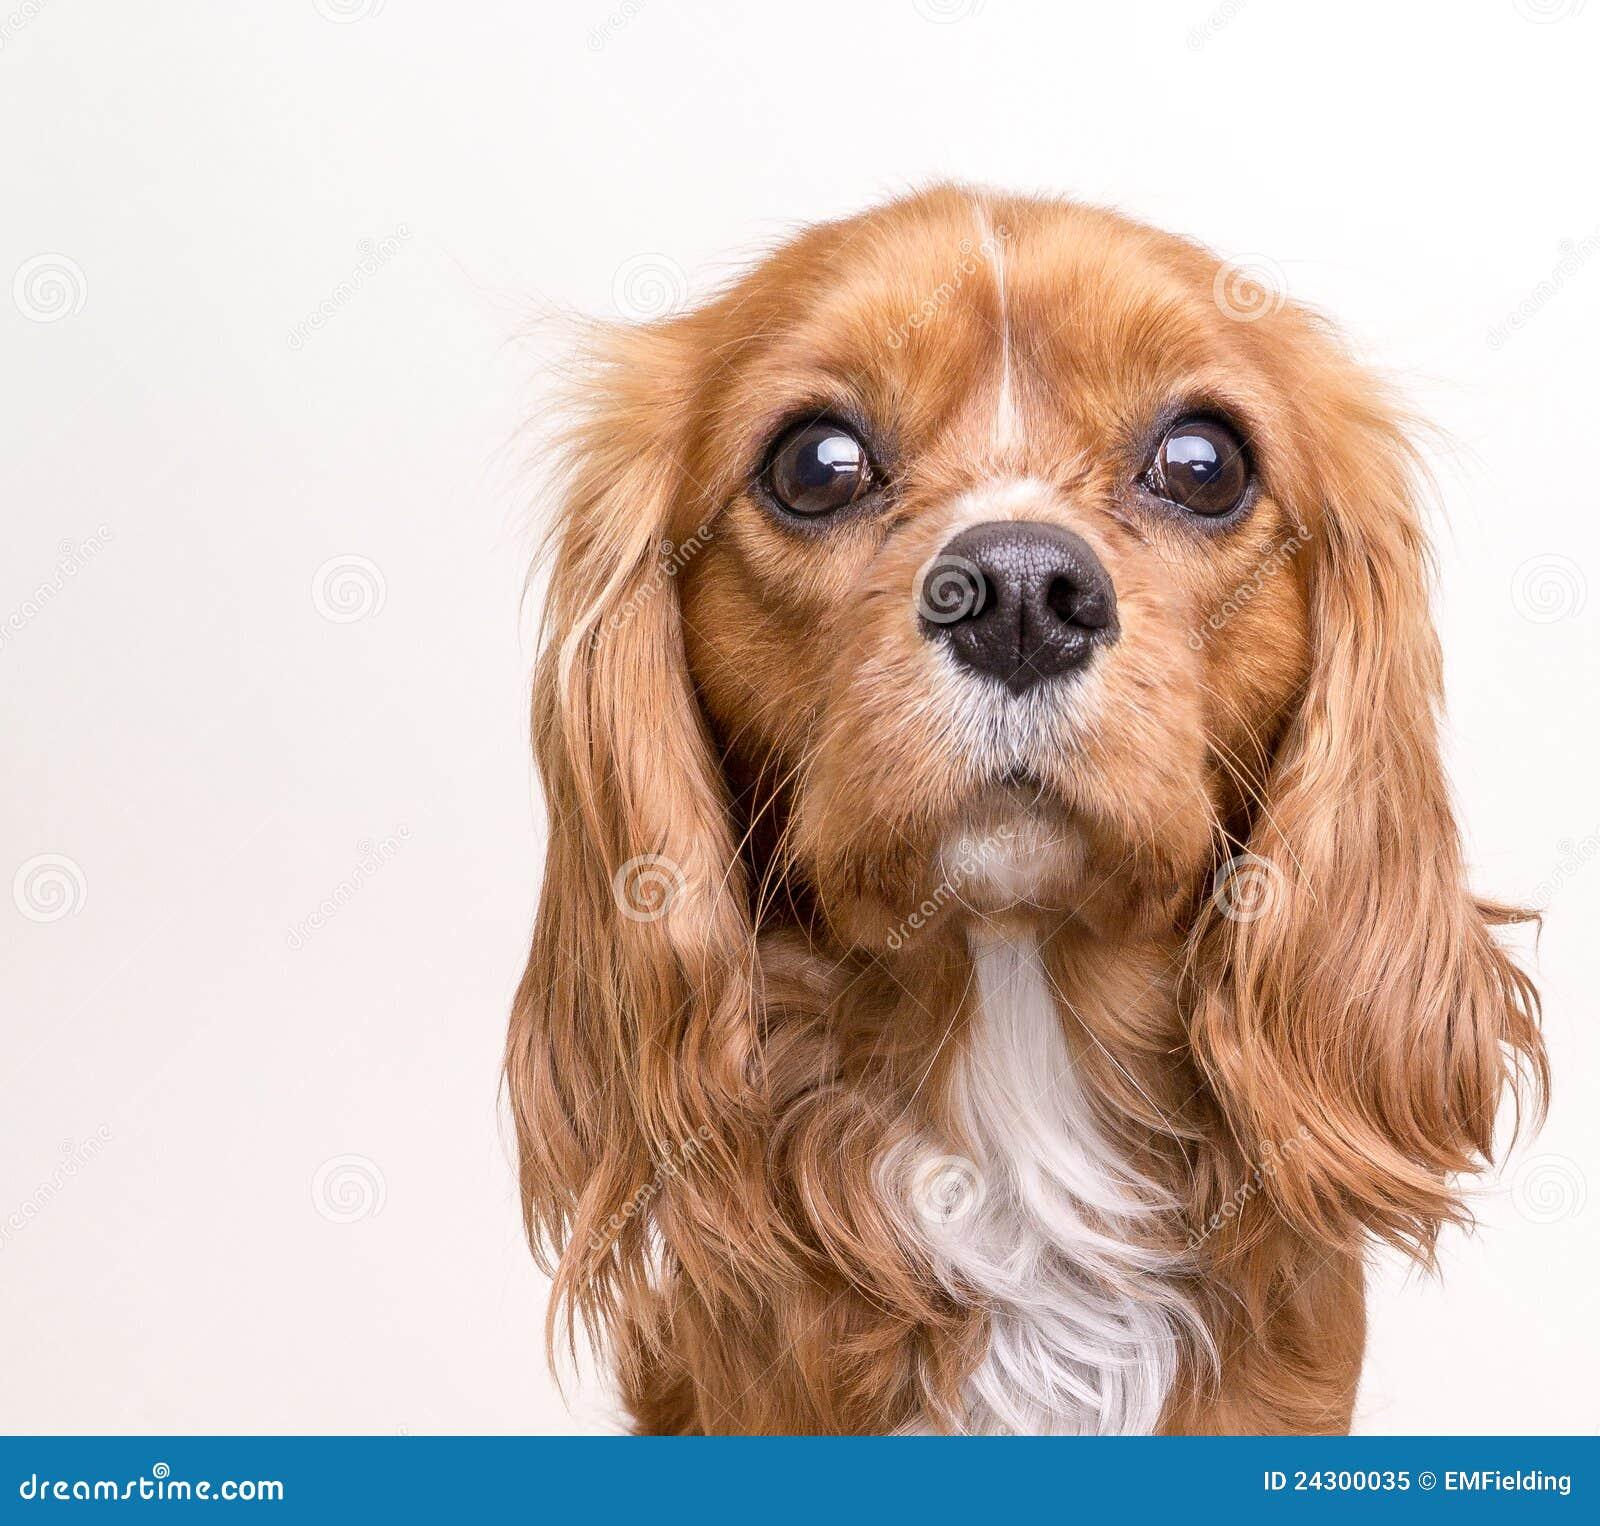 Spaniel Dog Nature